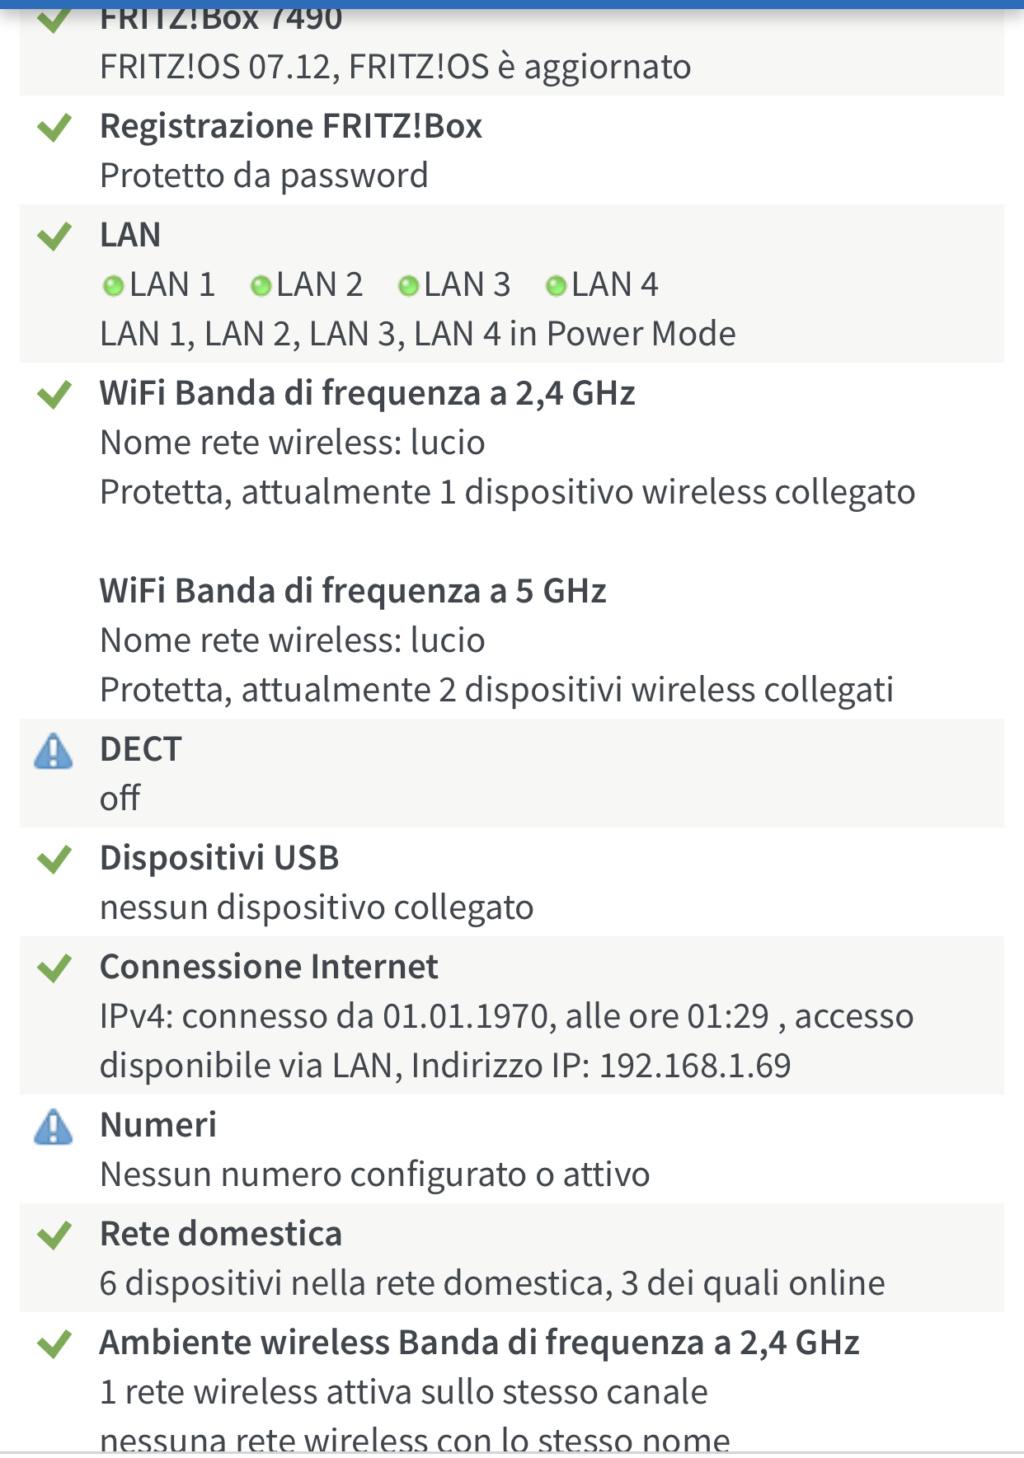 Fritz 7490 non si connette a internet Ae66c810